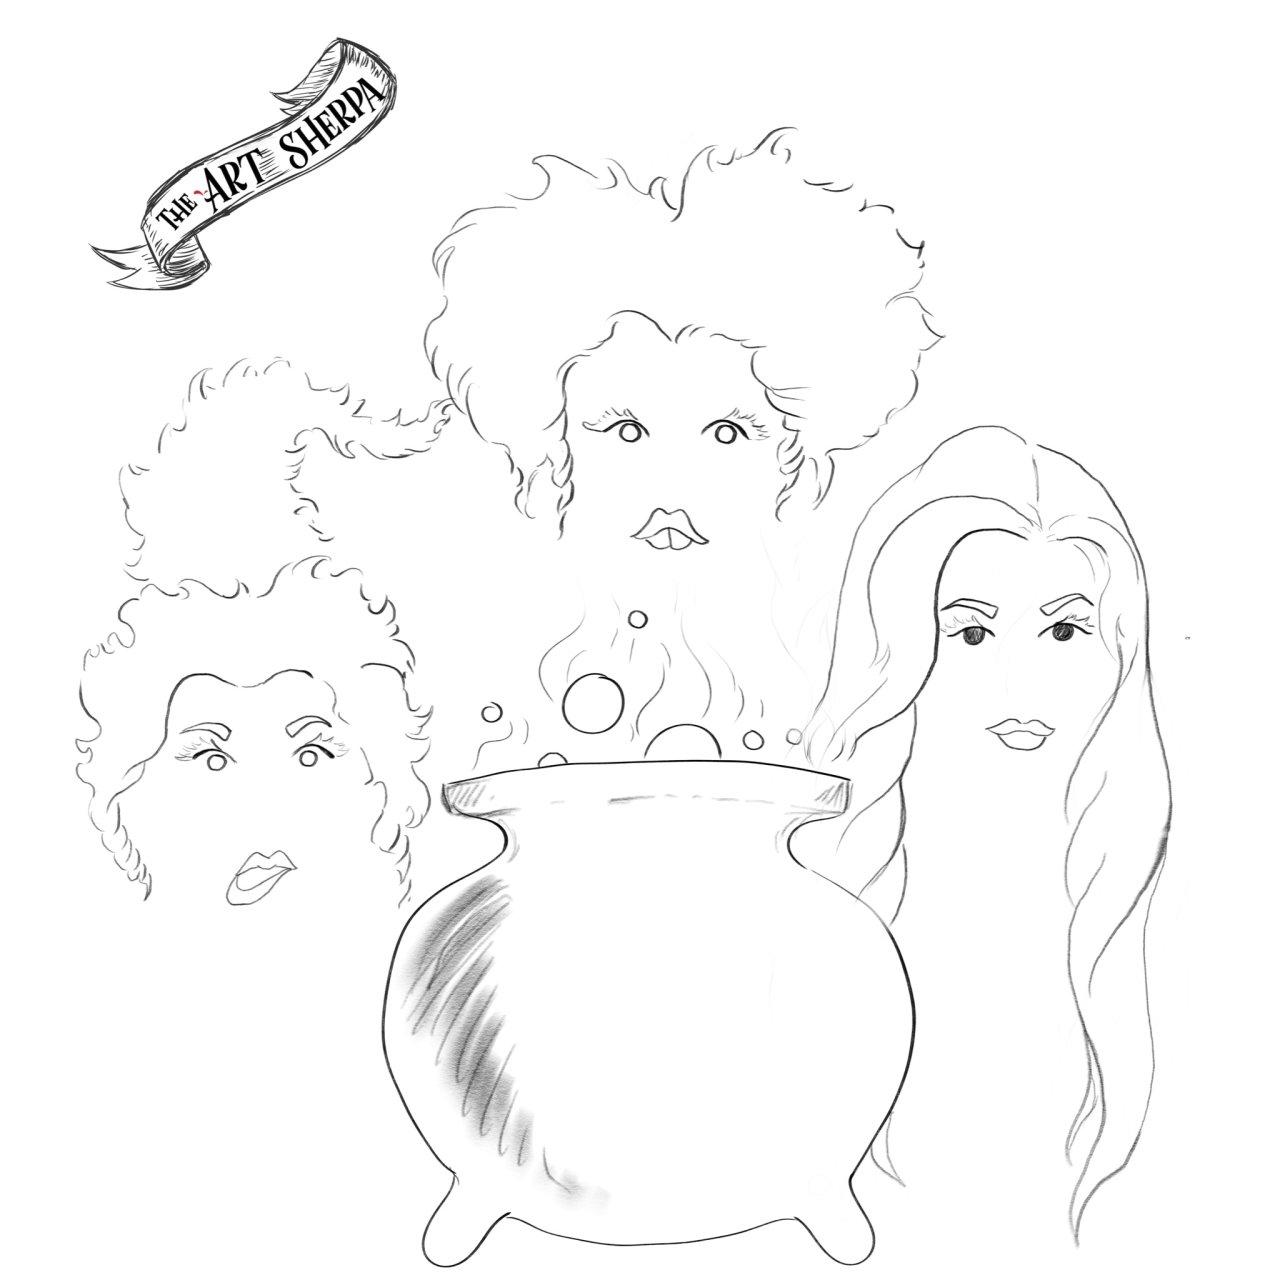 The Sisters Hocus Pocus watercolor traceable